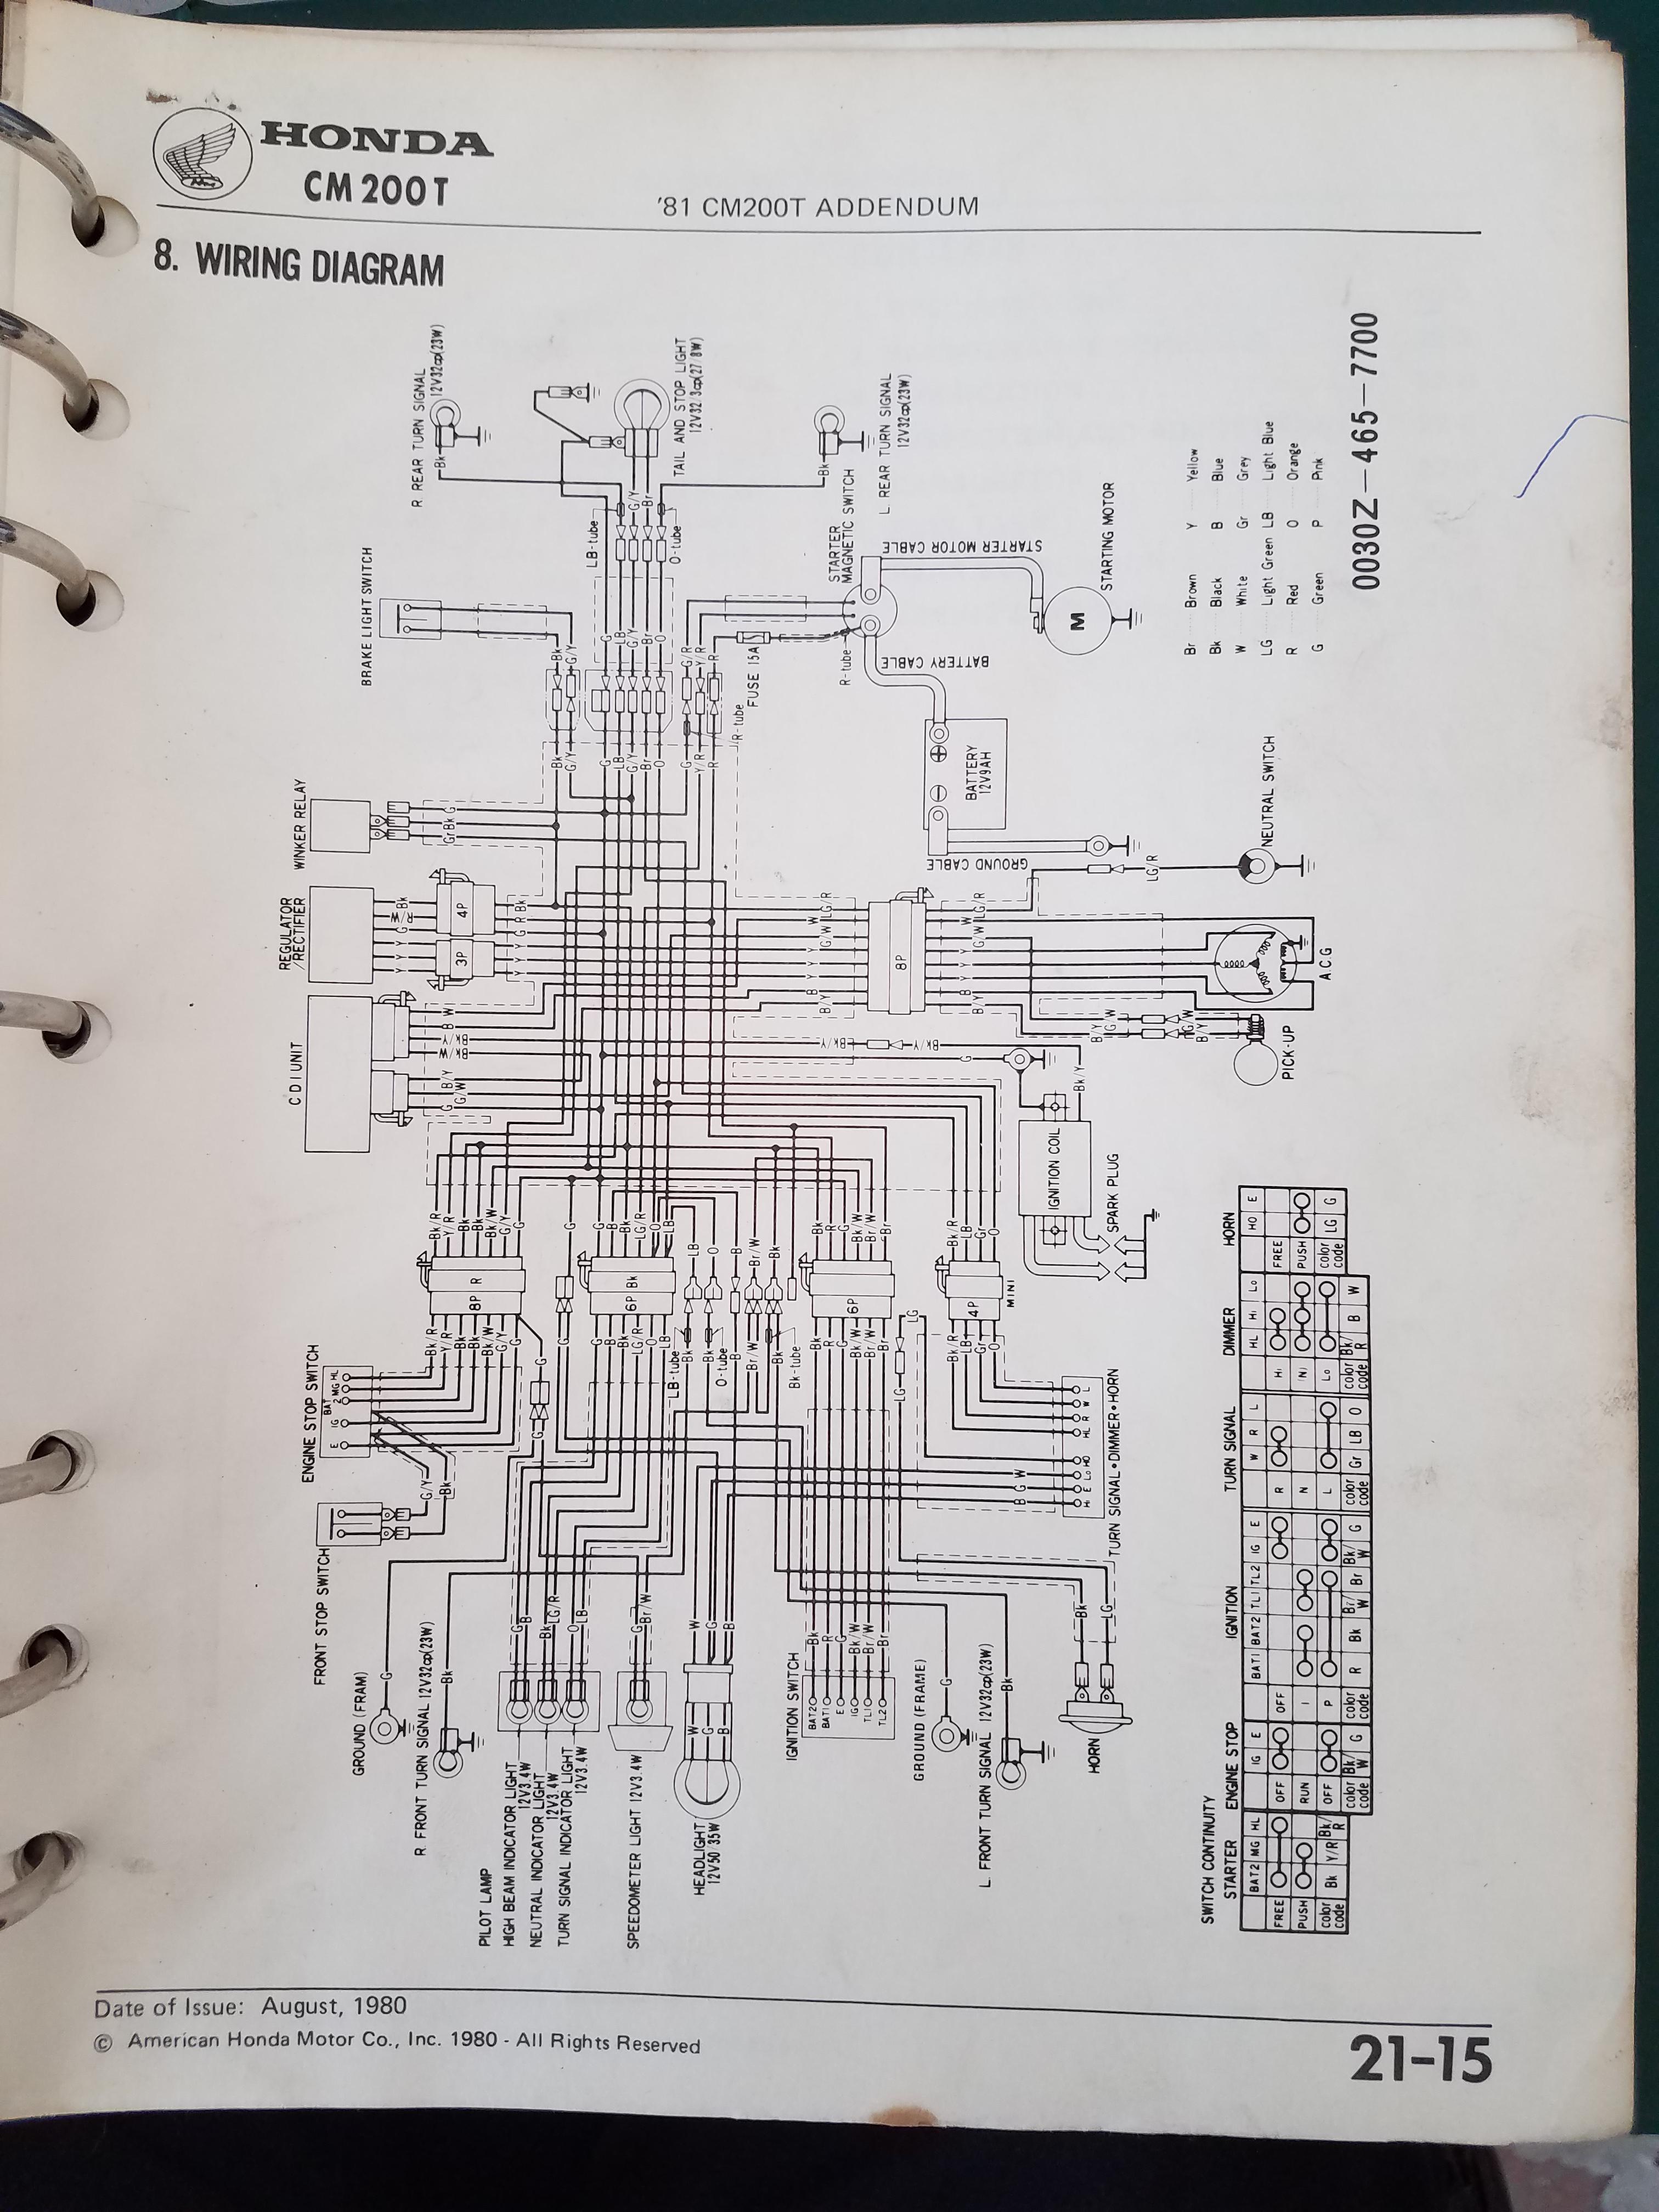 Honda Cm200 Wiring Diagram - wiring diagram load-title -  load-title.pennyapp.it   1980 Honda Cm200 Wiring Diagram      PennyApp